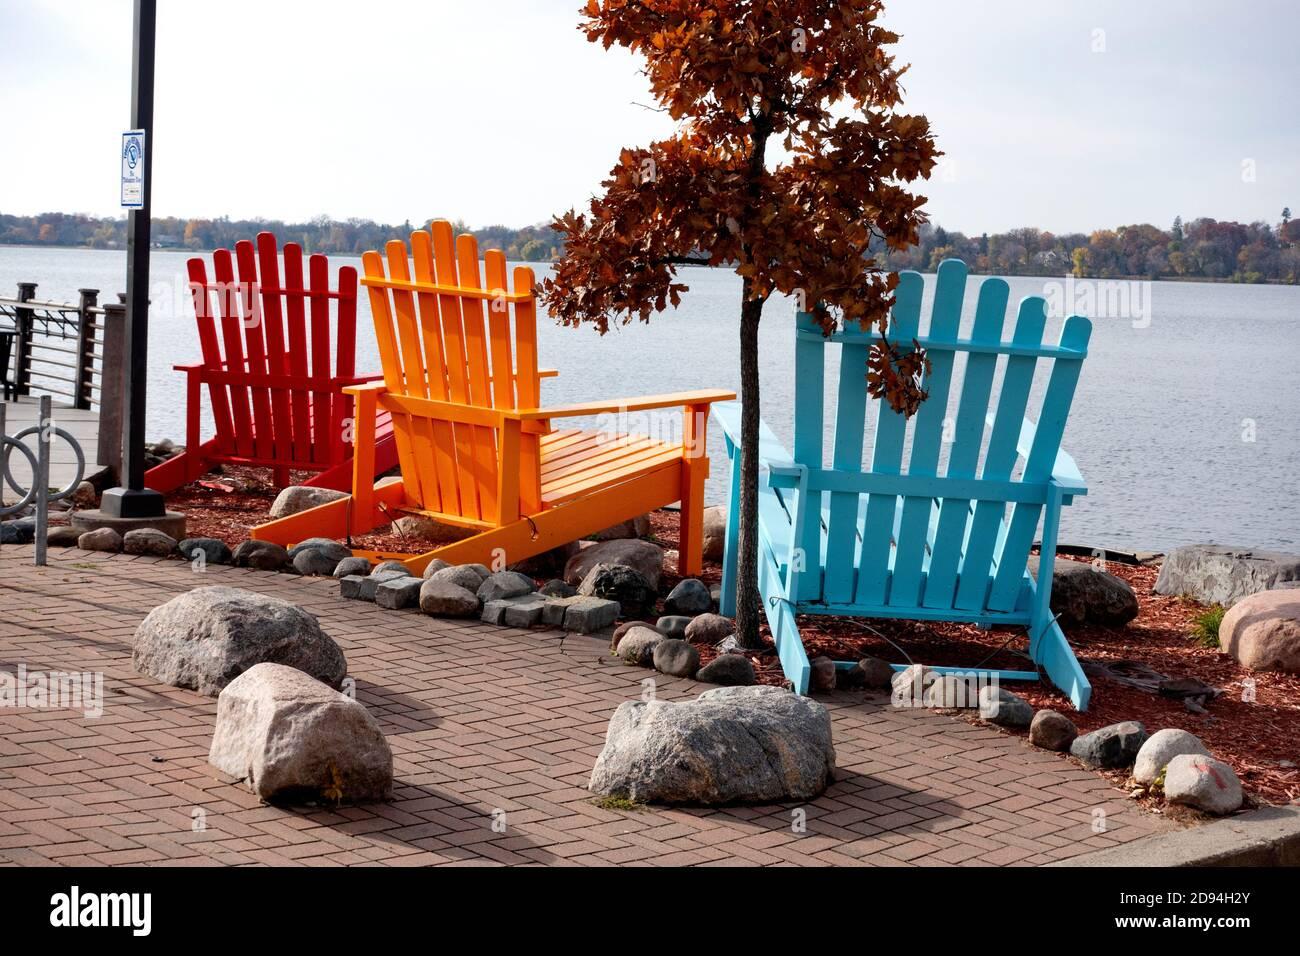 Jumbo colorful Adriatic chairs overlooking Lake Bde Maka Ska. Minneapolis Minnesota MN USA Stock Photo